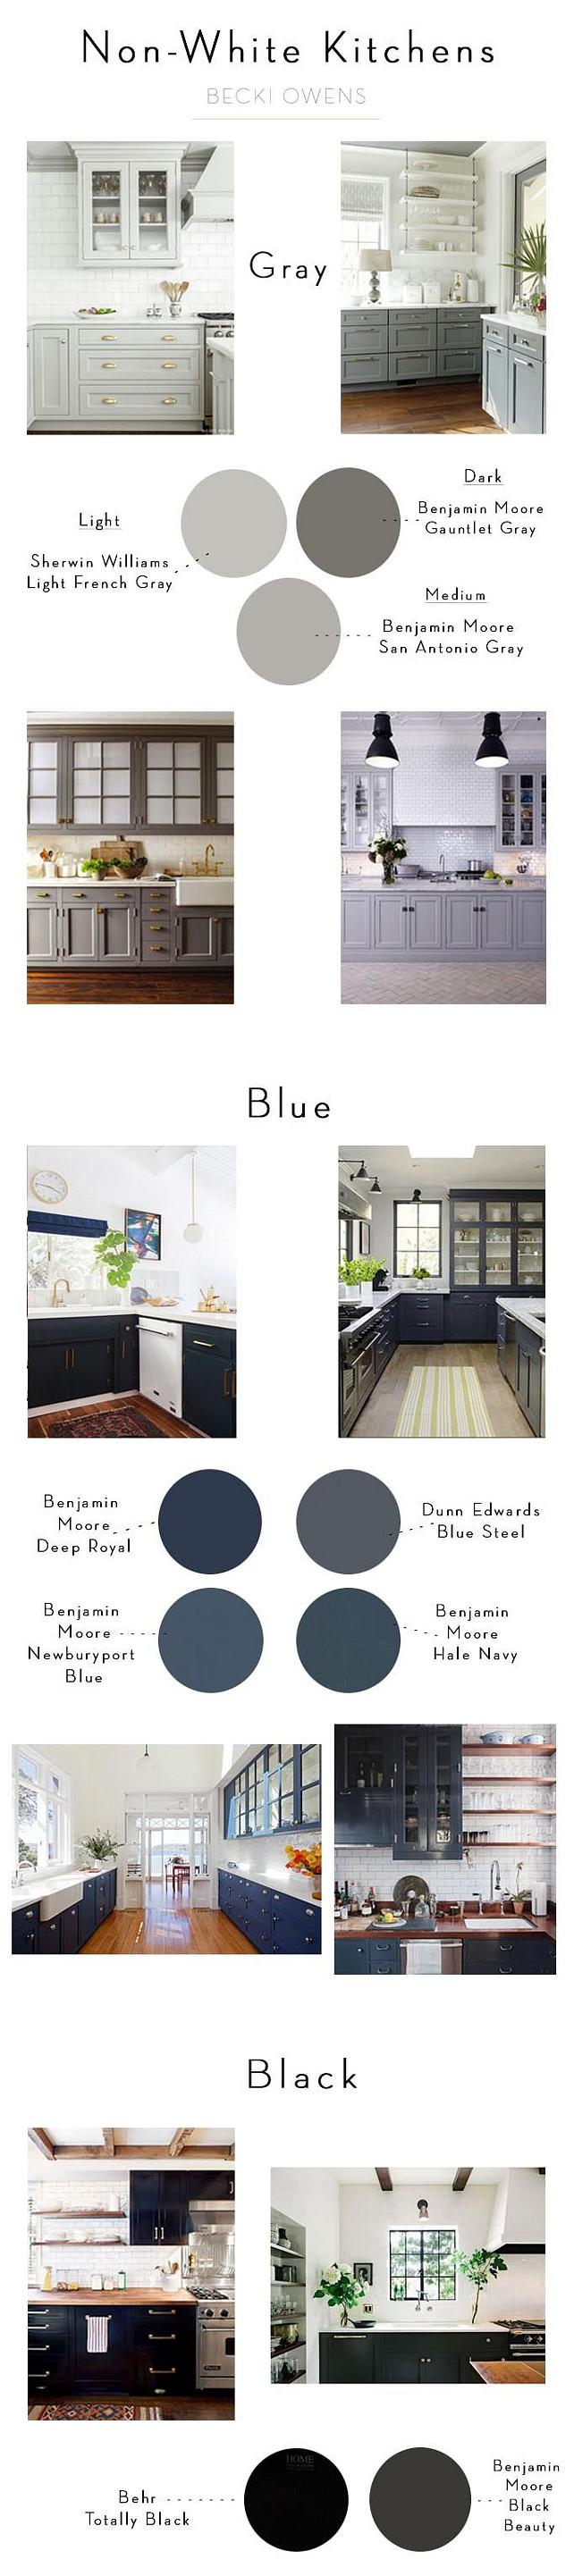 Dark Blue Smokey Quote Wallpaper Interior Design Ideas Home Bunch Interior Design Ideas